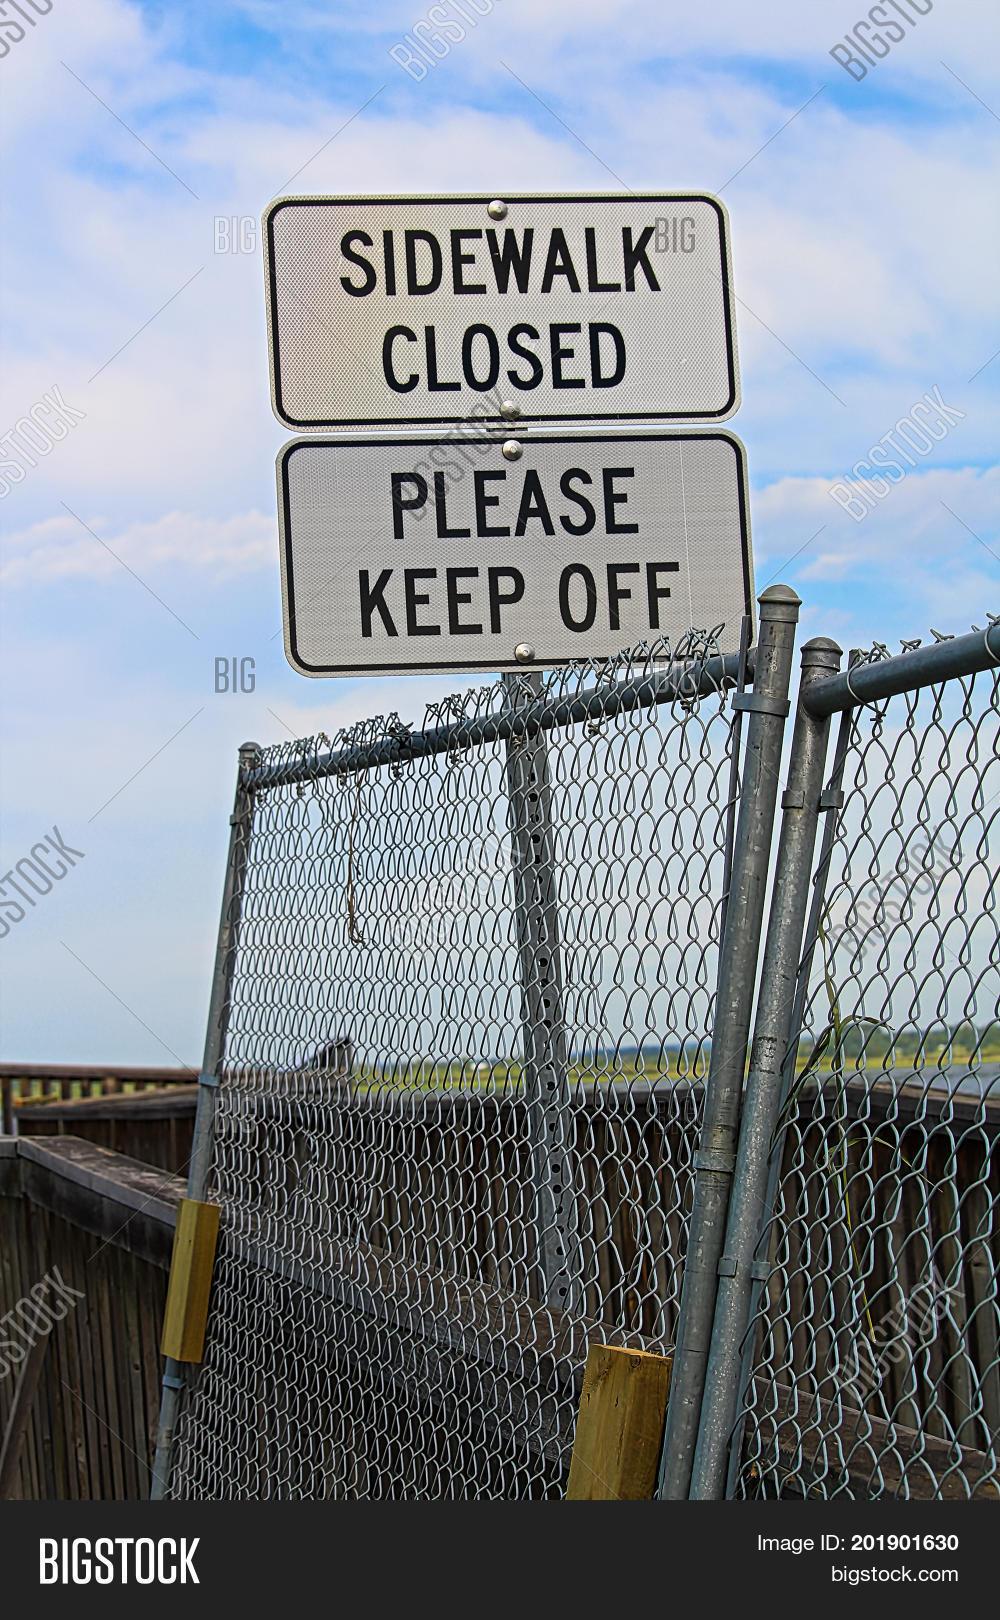 Sidewalk Closed, Image & Photo (Free Trial) | Bigstock